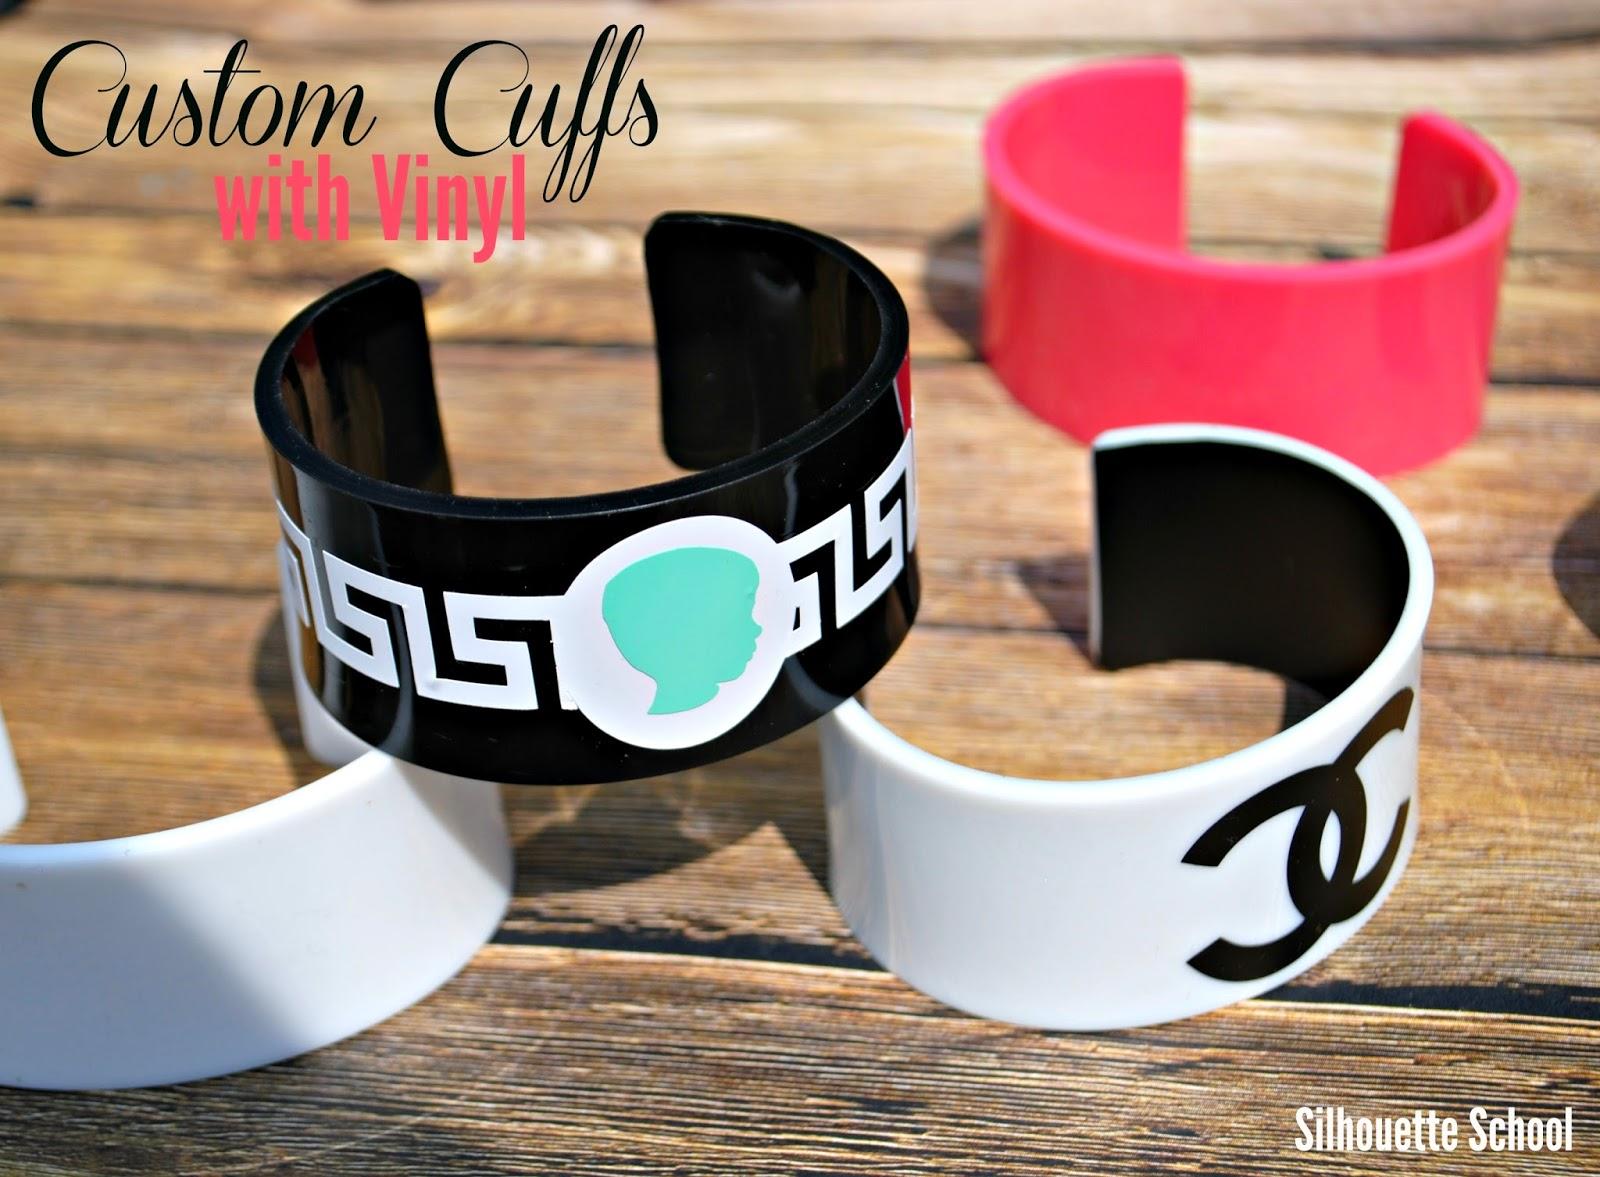 Custom, cuffs, vinyl, Silhouette tutorial, Silhouette Studio